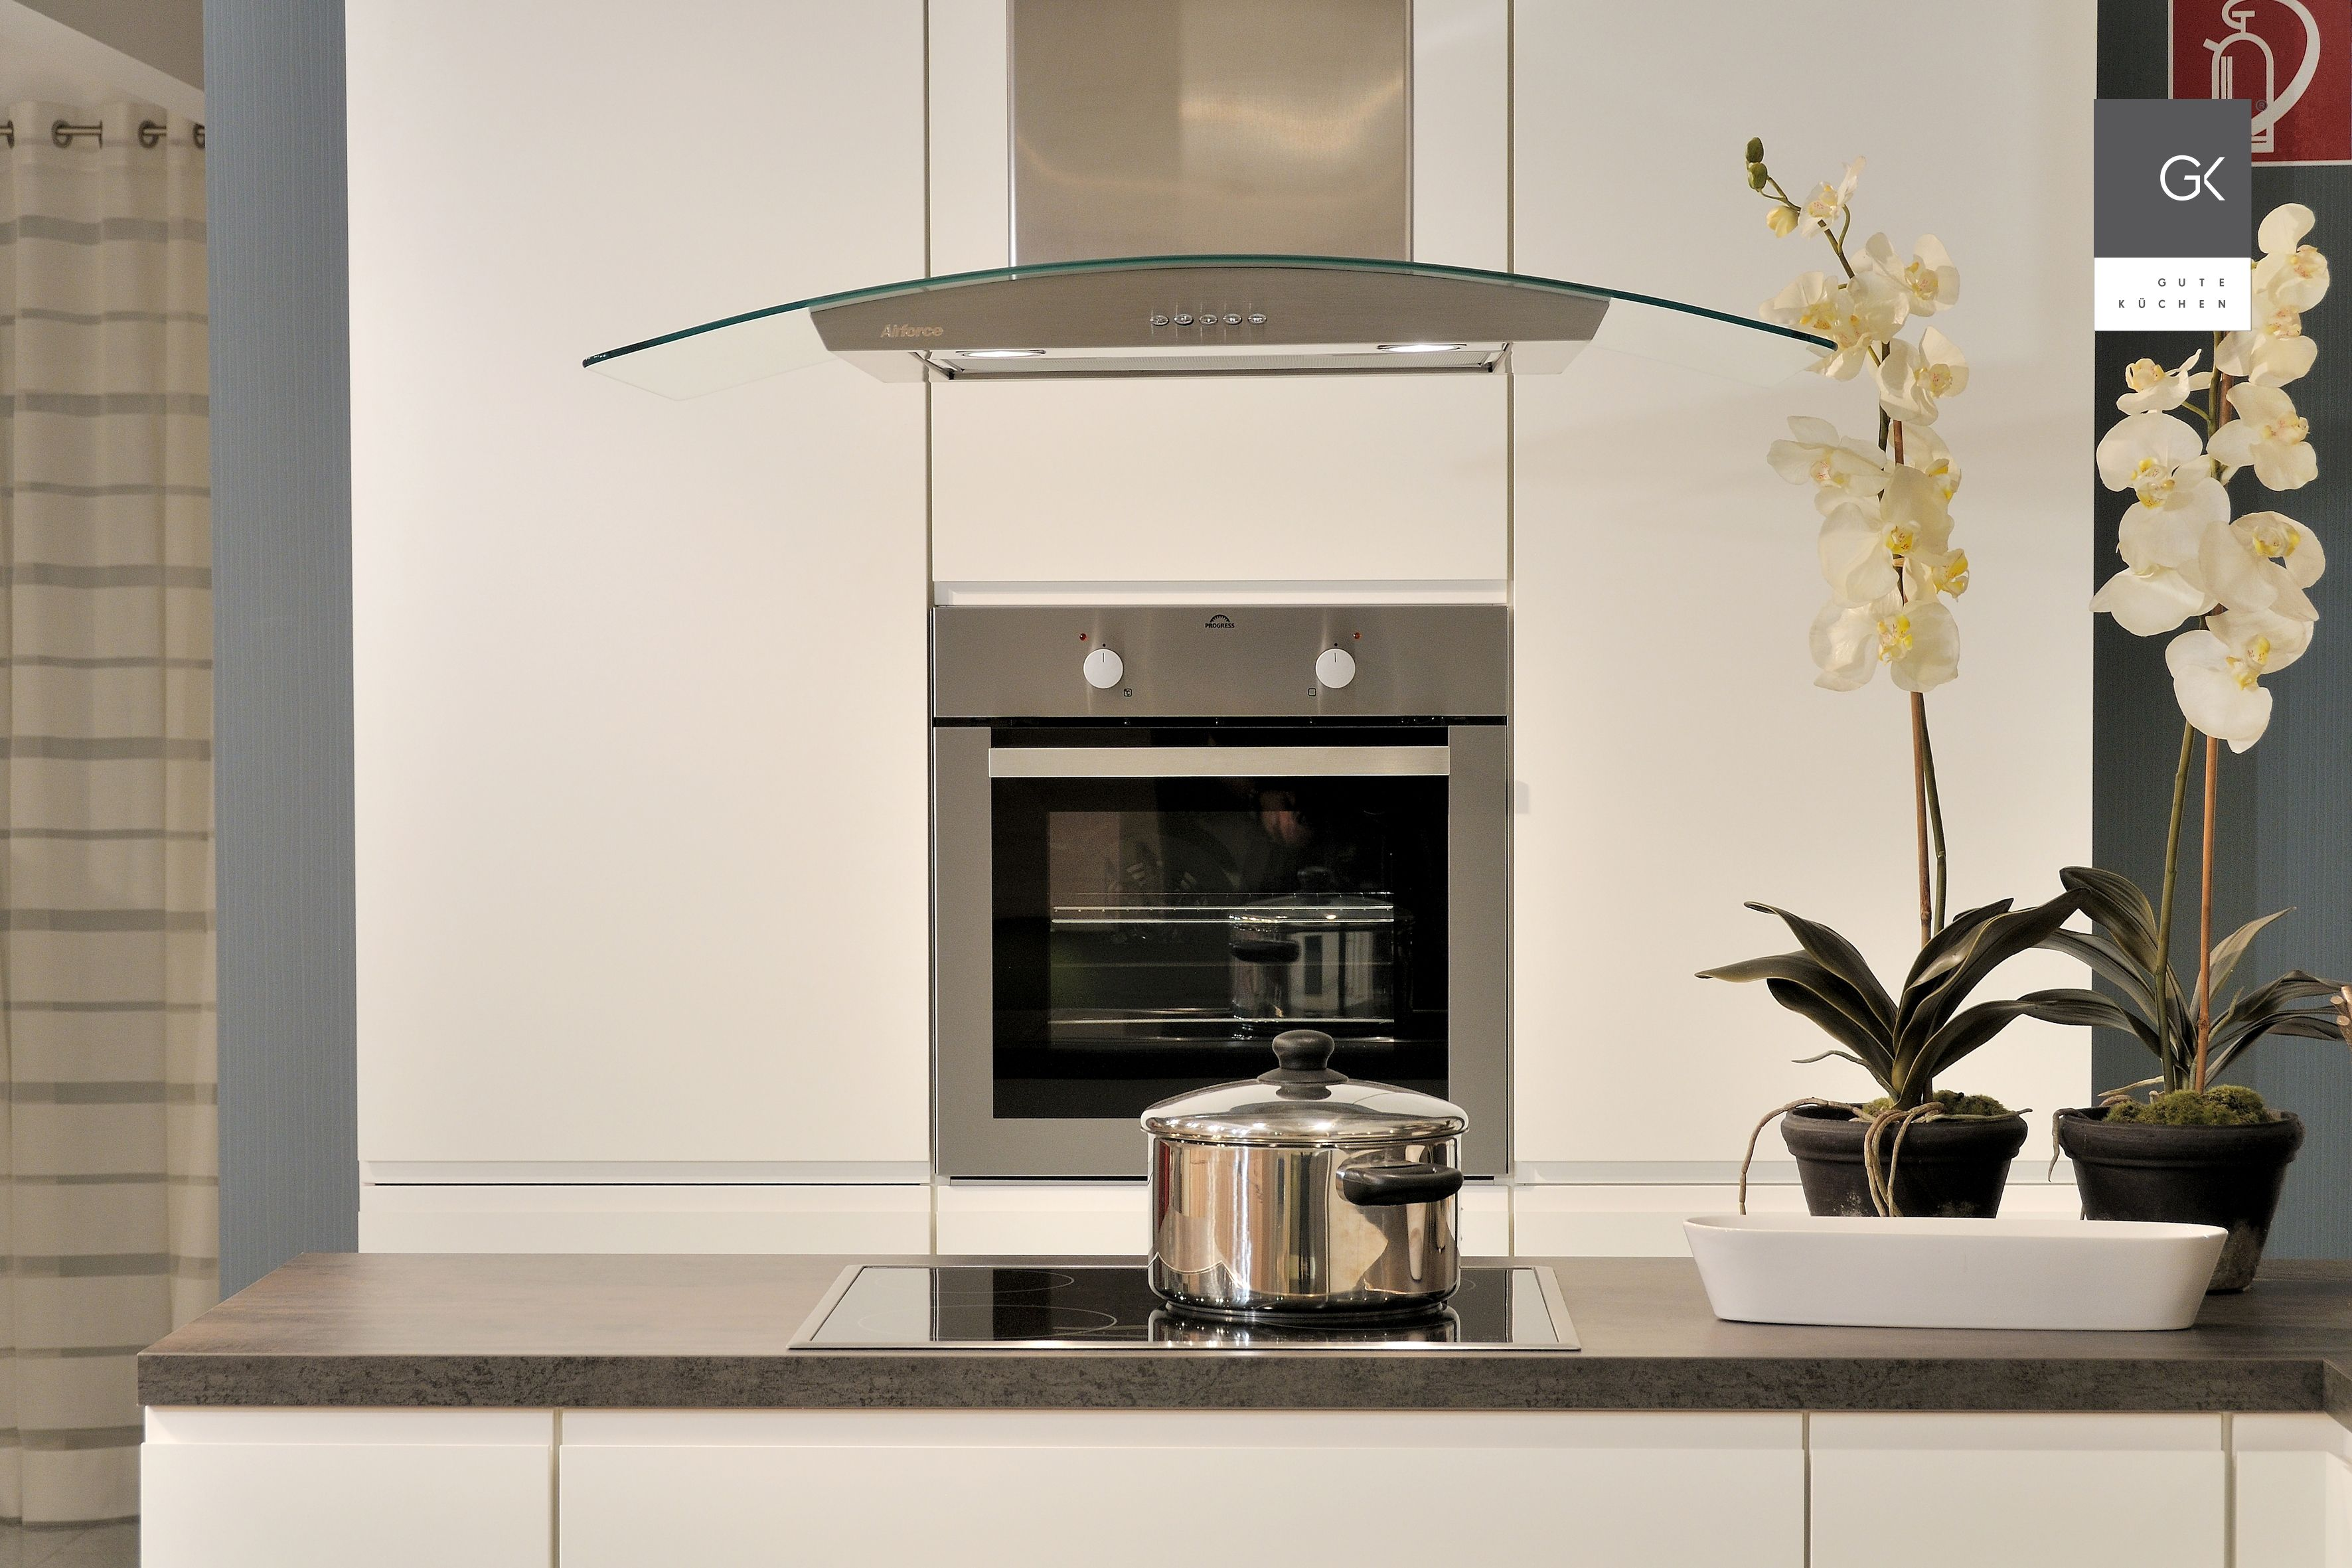 moderne abzugshaube perfect die offene kche in wei. Black Bedroom Furniture Sets. Home Design Ideas